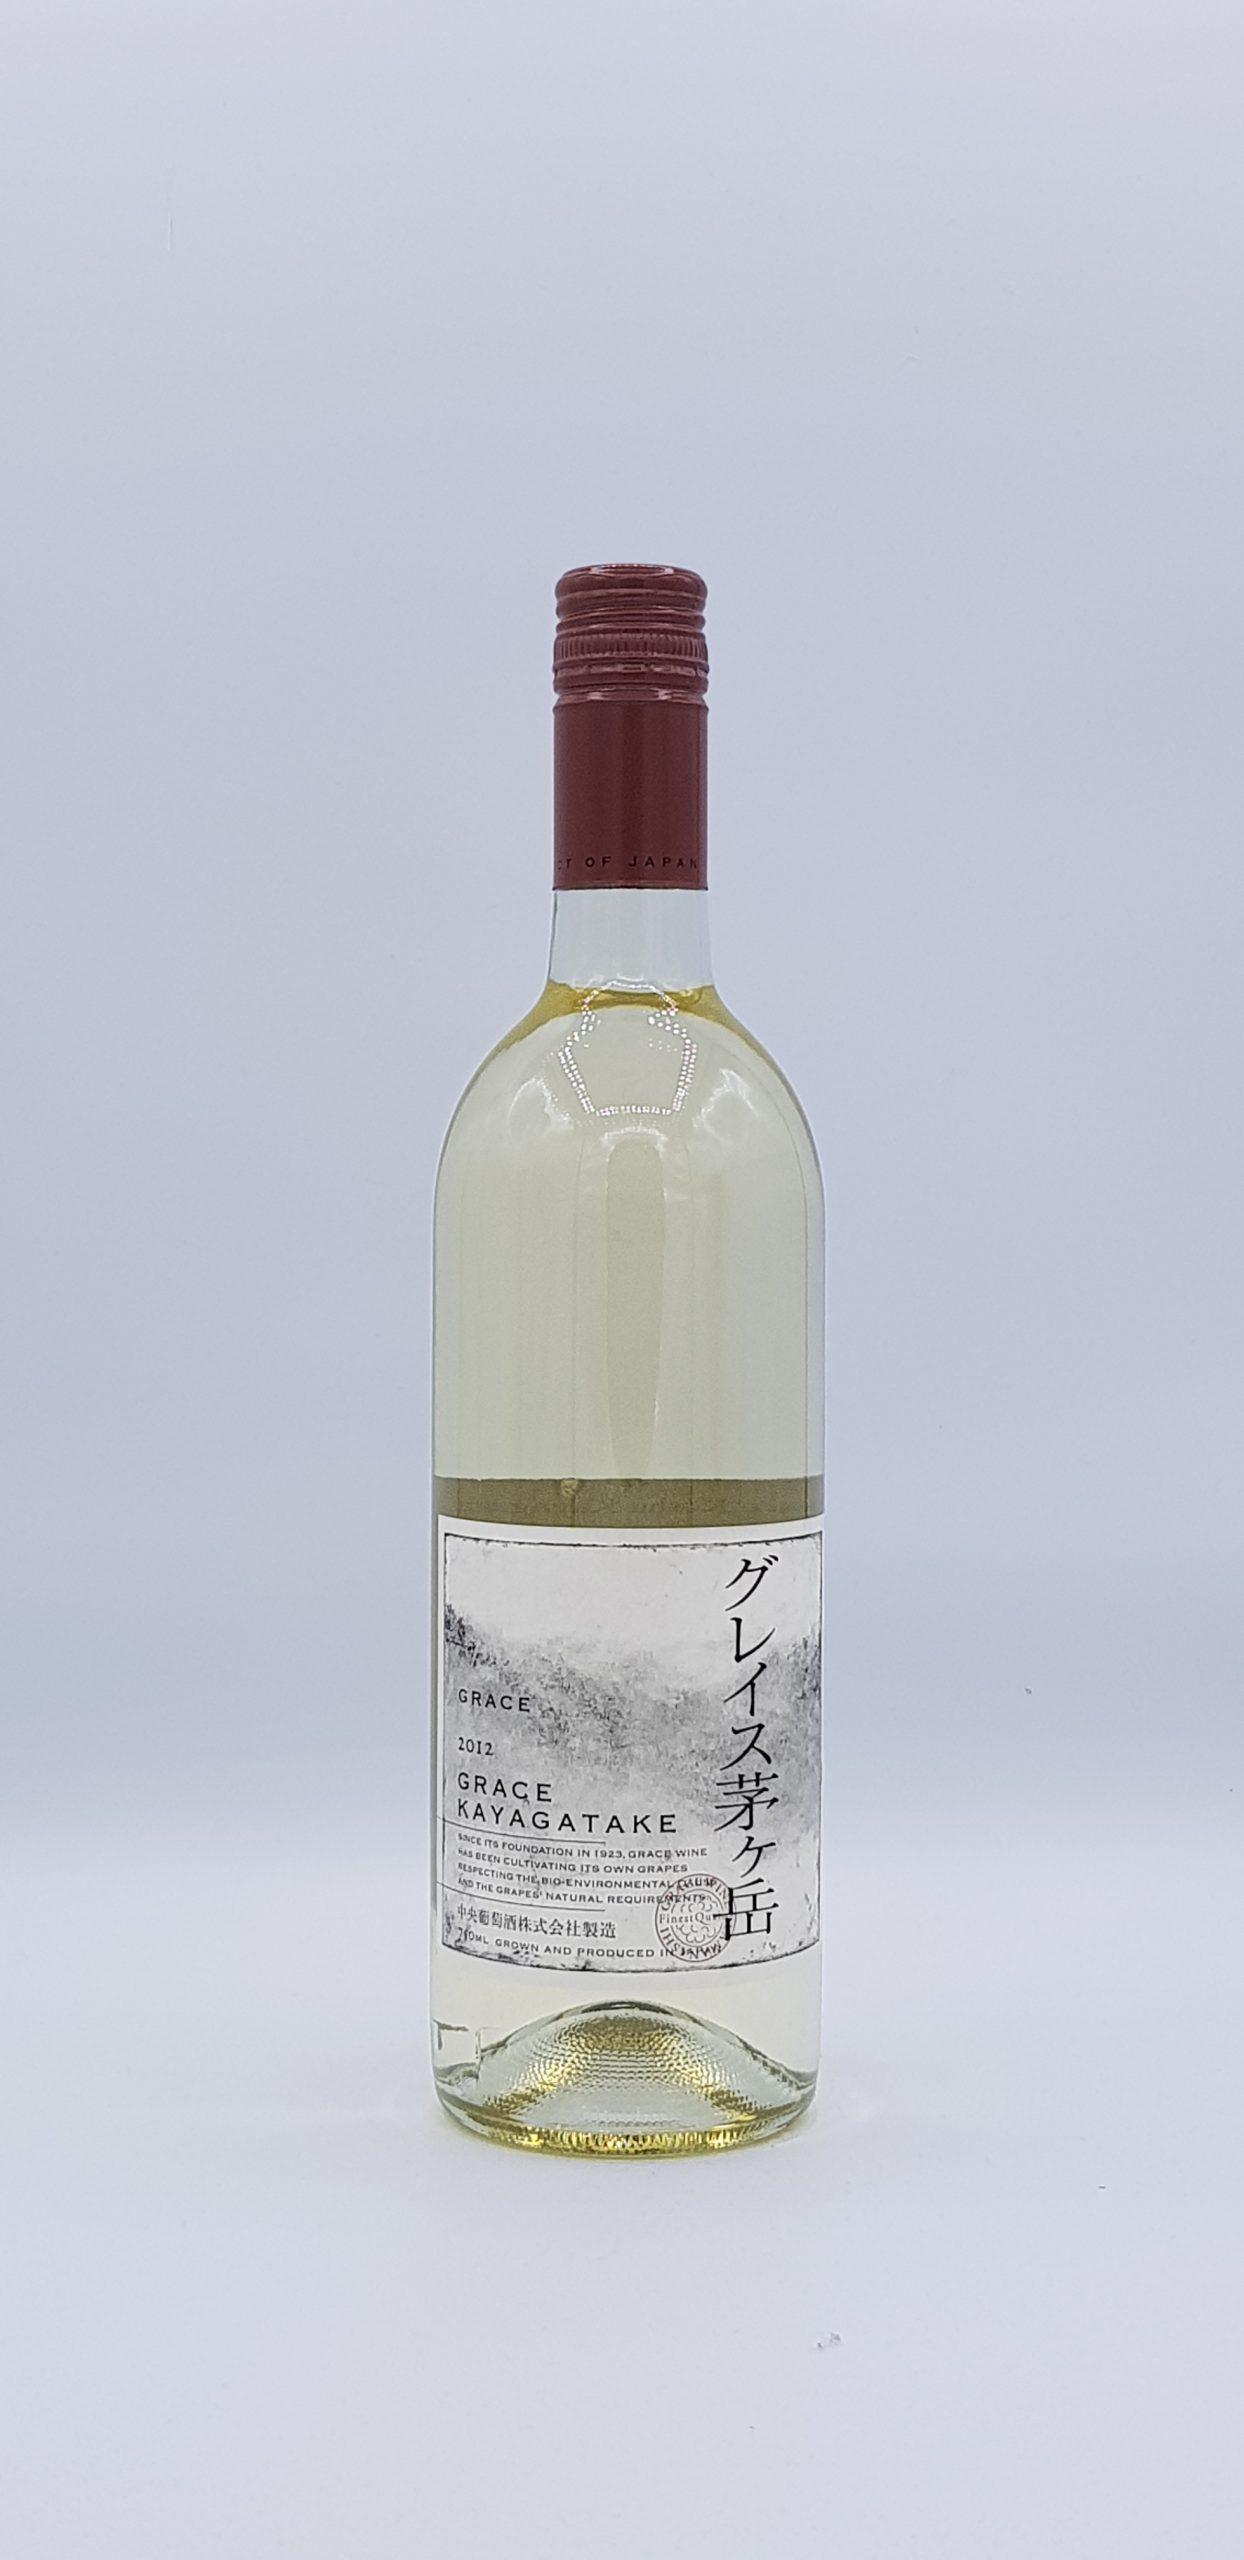 Japon Grace Koshu kayagatake 2012 Blanc